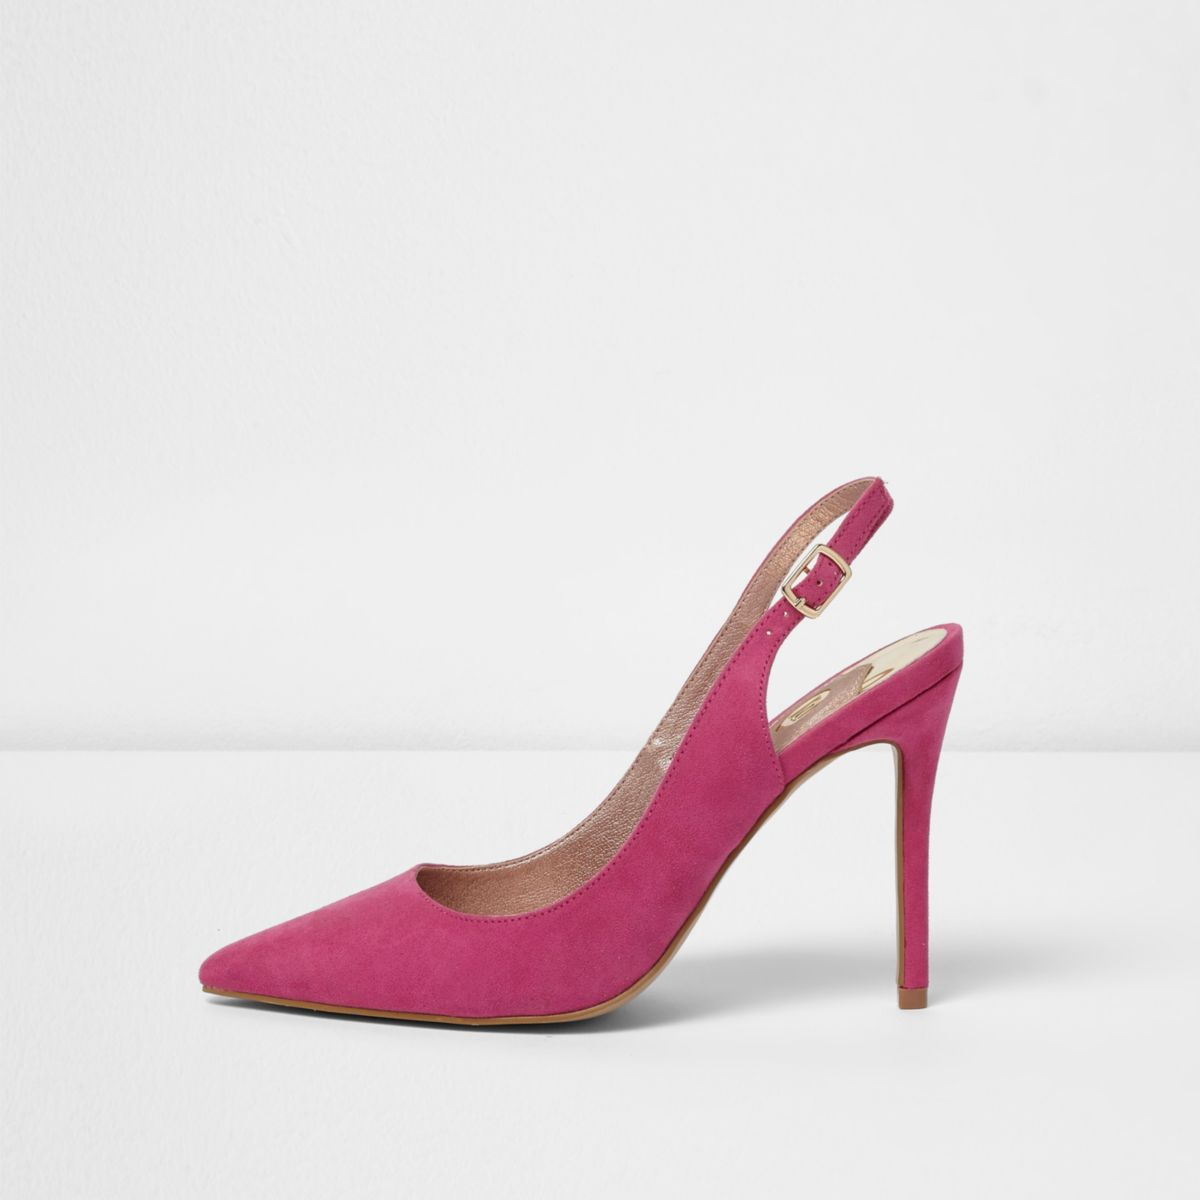 Pink slingback pumps